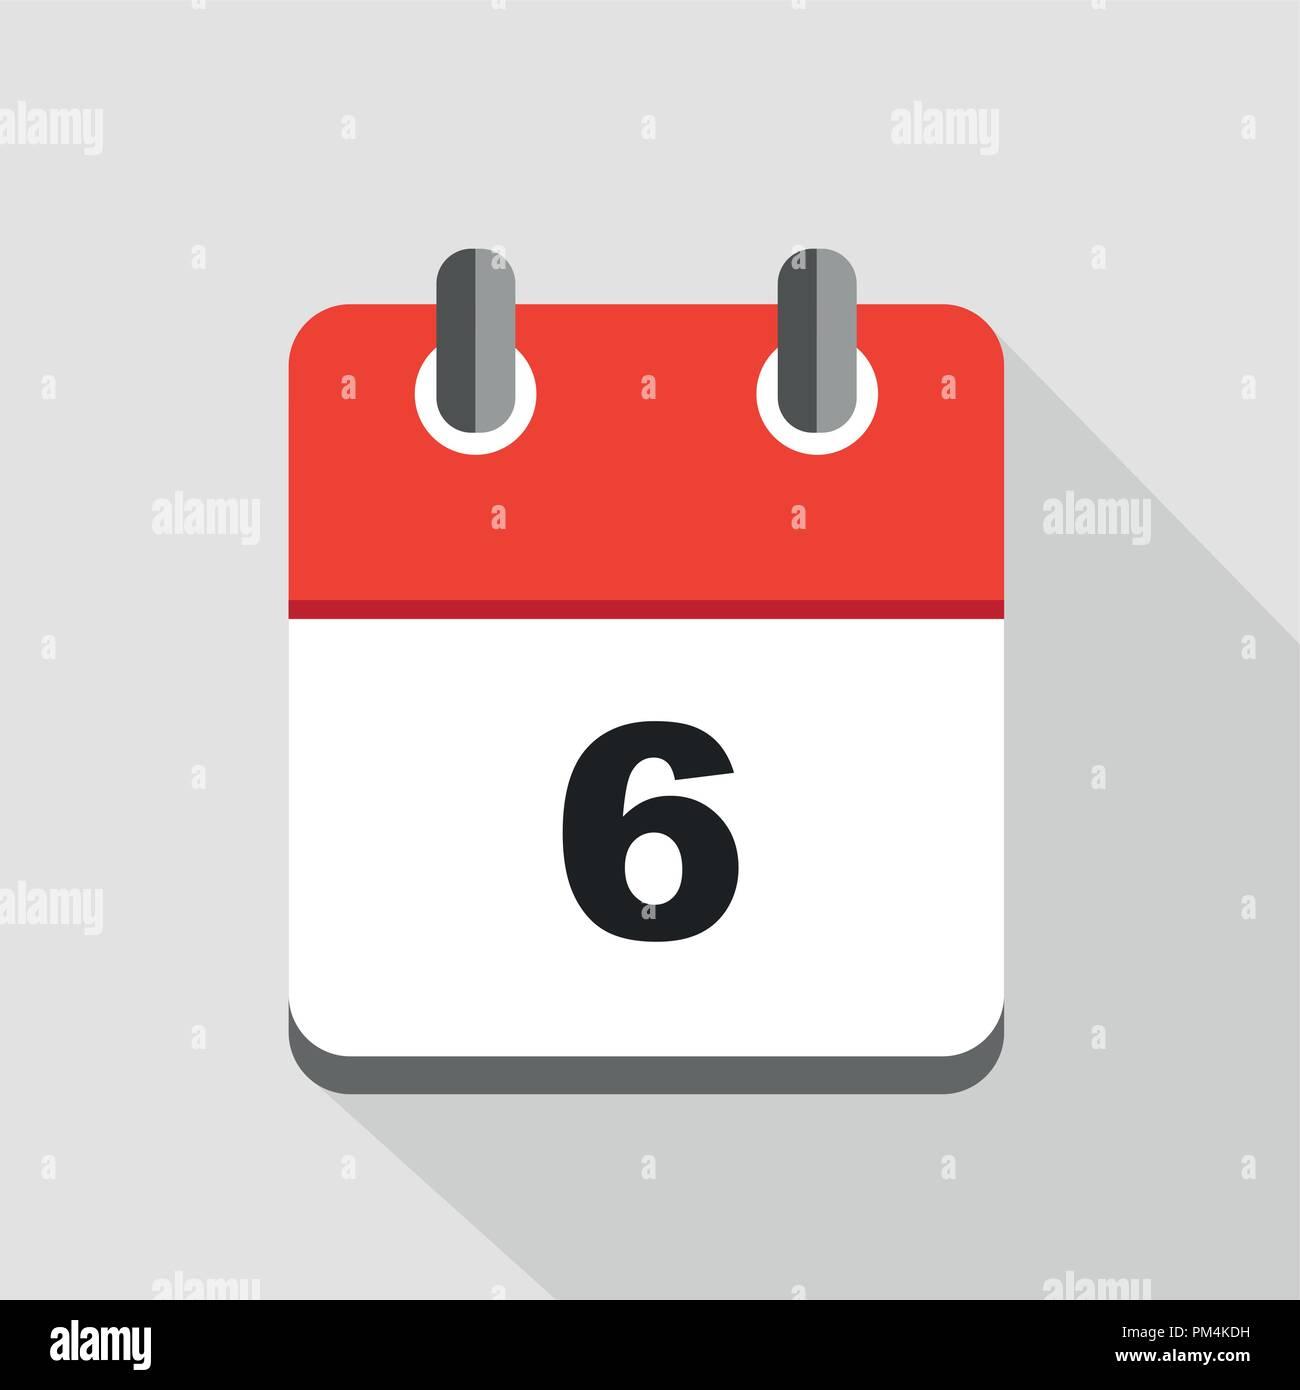 Illustration Calendrier.Vector Illustration Of Red Calendar 6 Icon Eps10 Stock